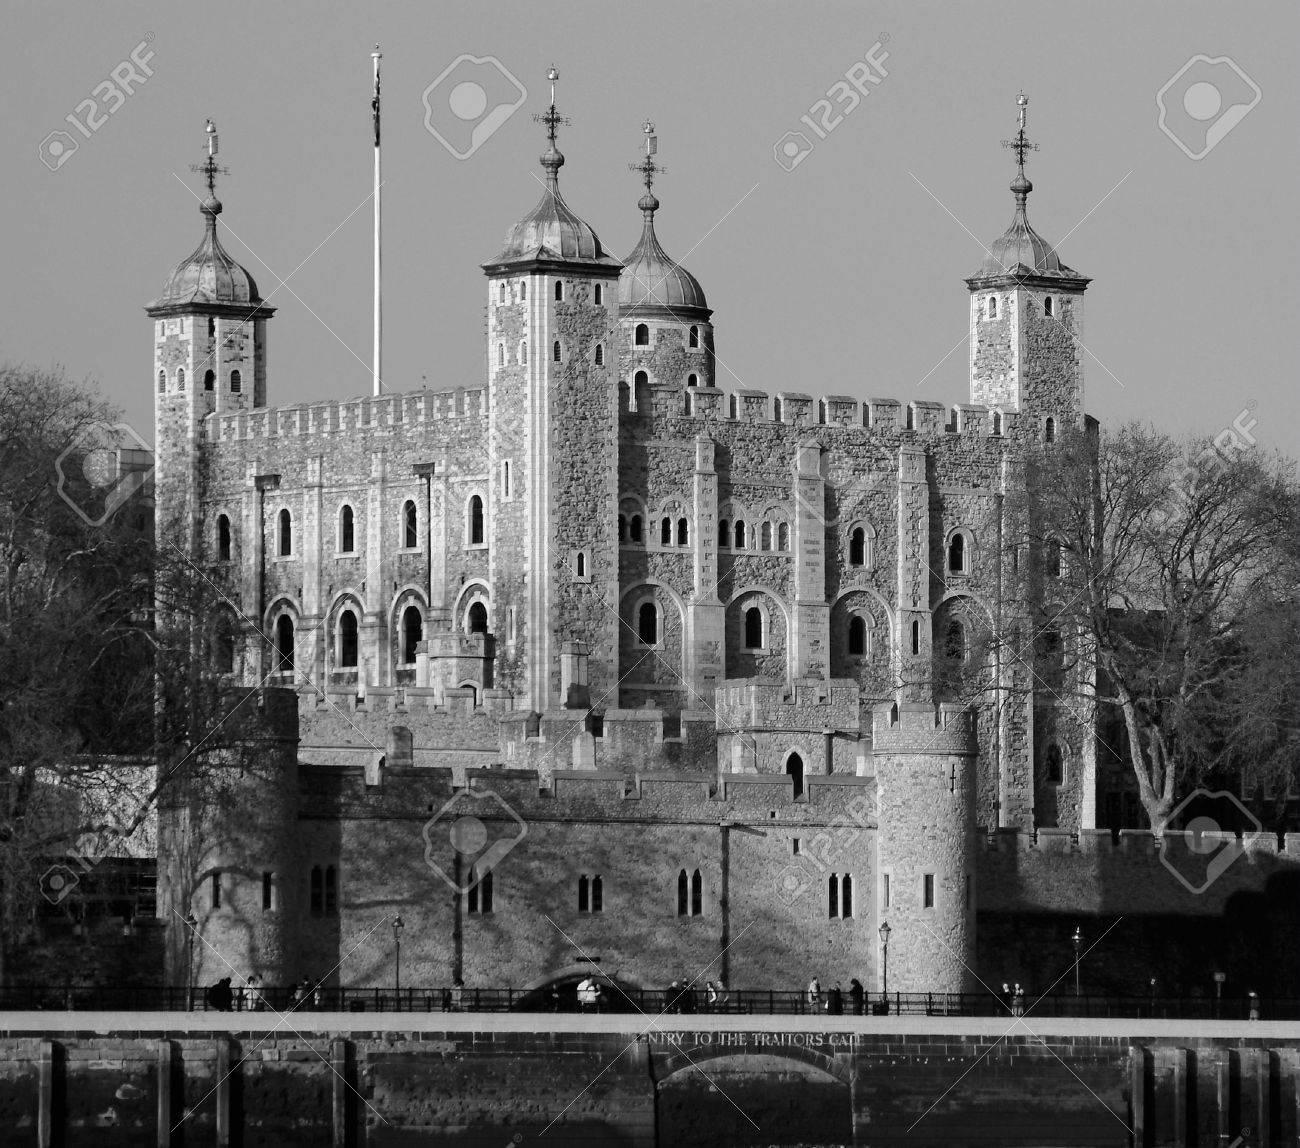 tower of london river thames england london uk united kingdom Stock Photo - 610606